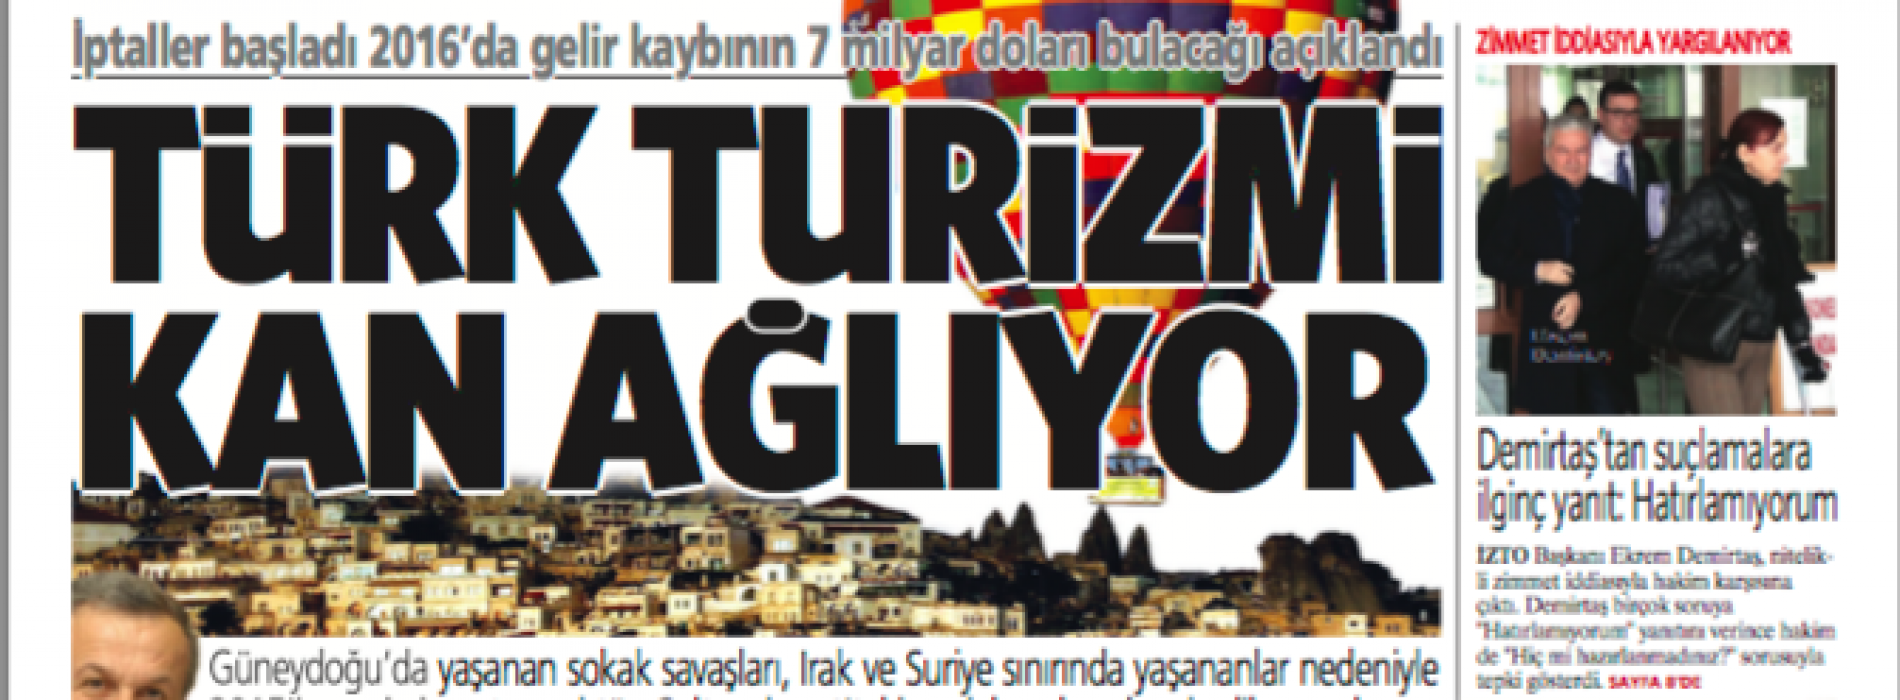 Ben Haber Gazetesi